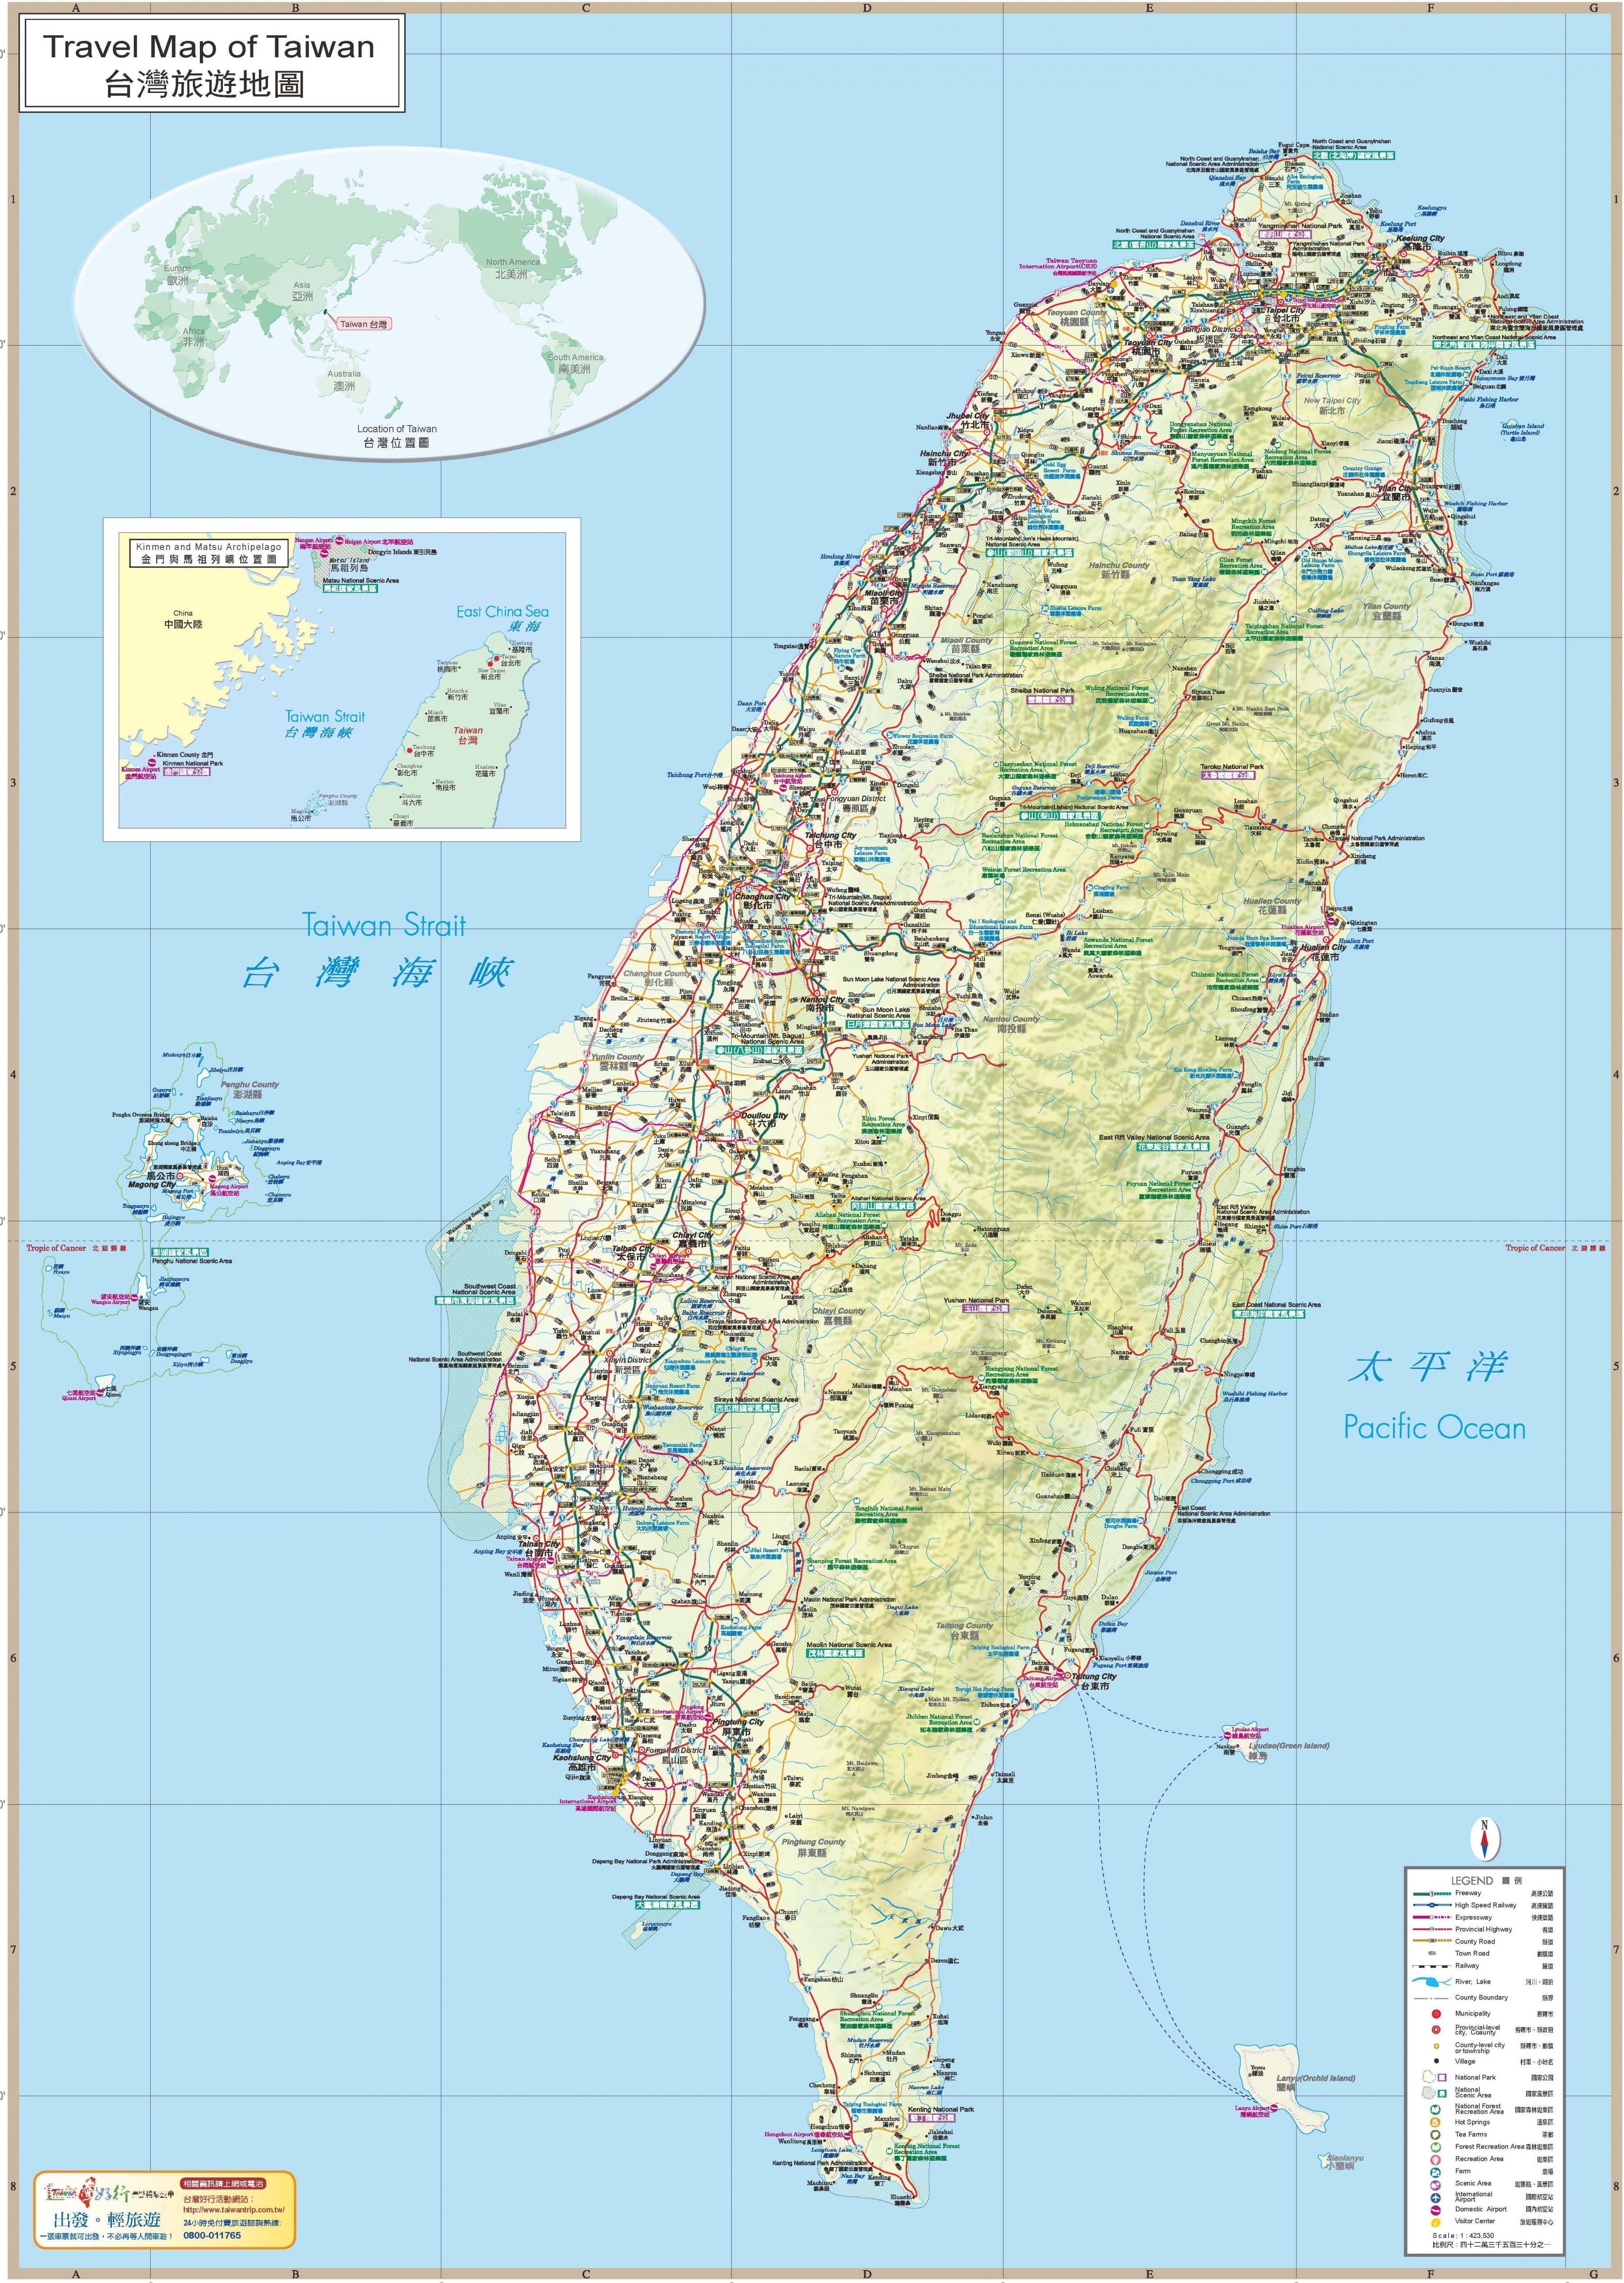 Carte Touristique Asie.Taiwan Carte Touristique Carte De Taiwan Attractions